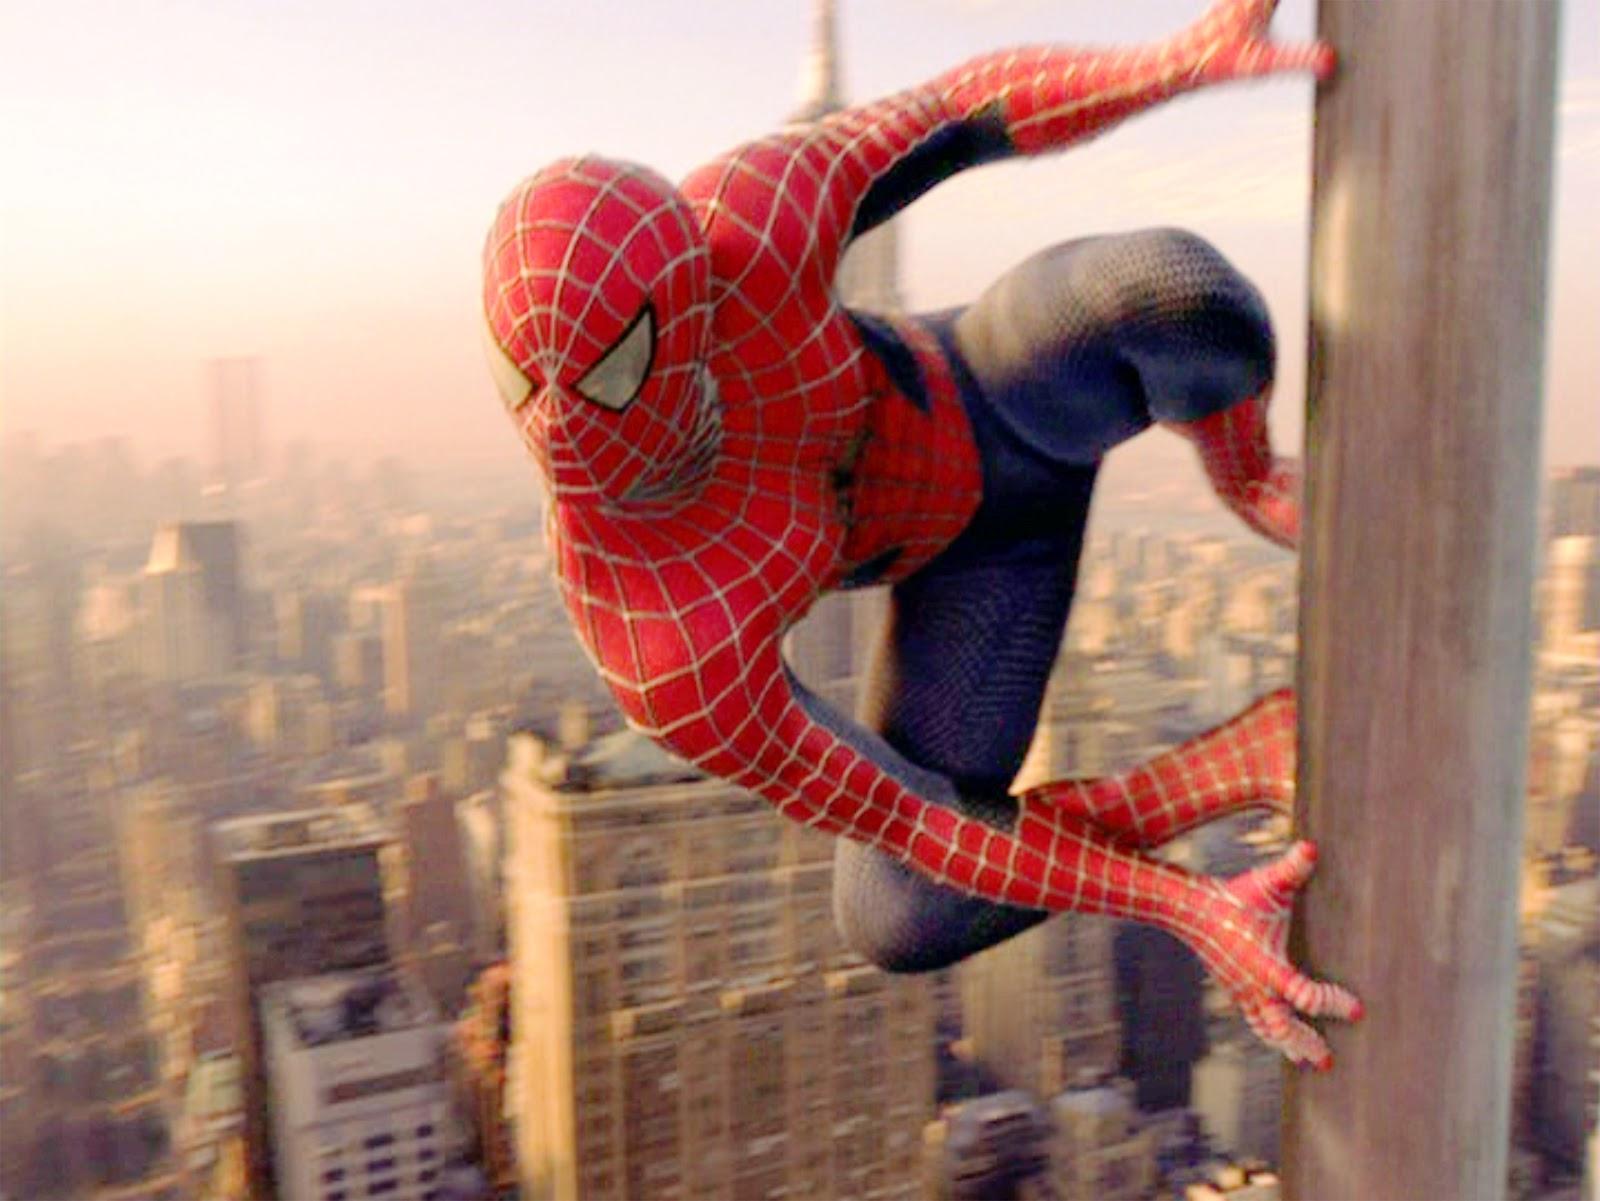 http://4.bp.blogspot.com/-_tCNXrrH6tY/T3df0e1dJwI/AAAAAAAAaVo/r85cQE_eOWo/s1600/Spider-Man_398Pyxurz.jpg